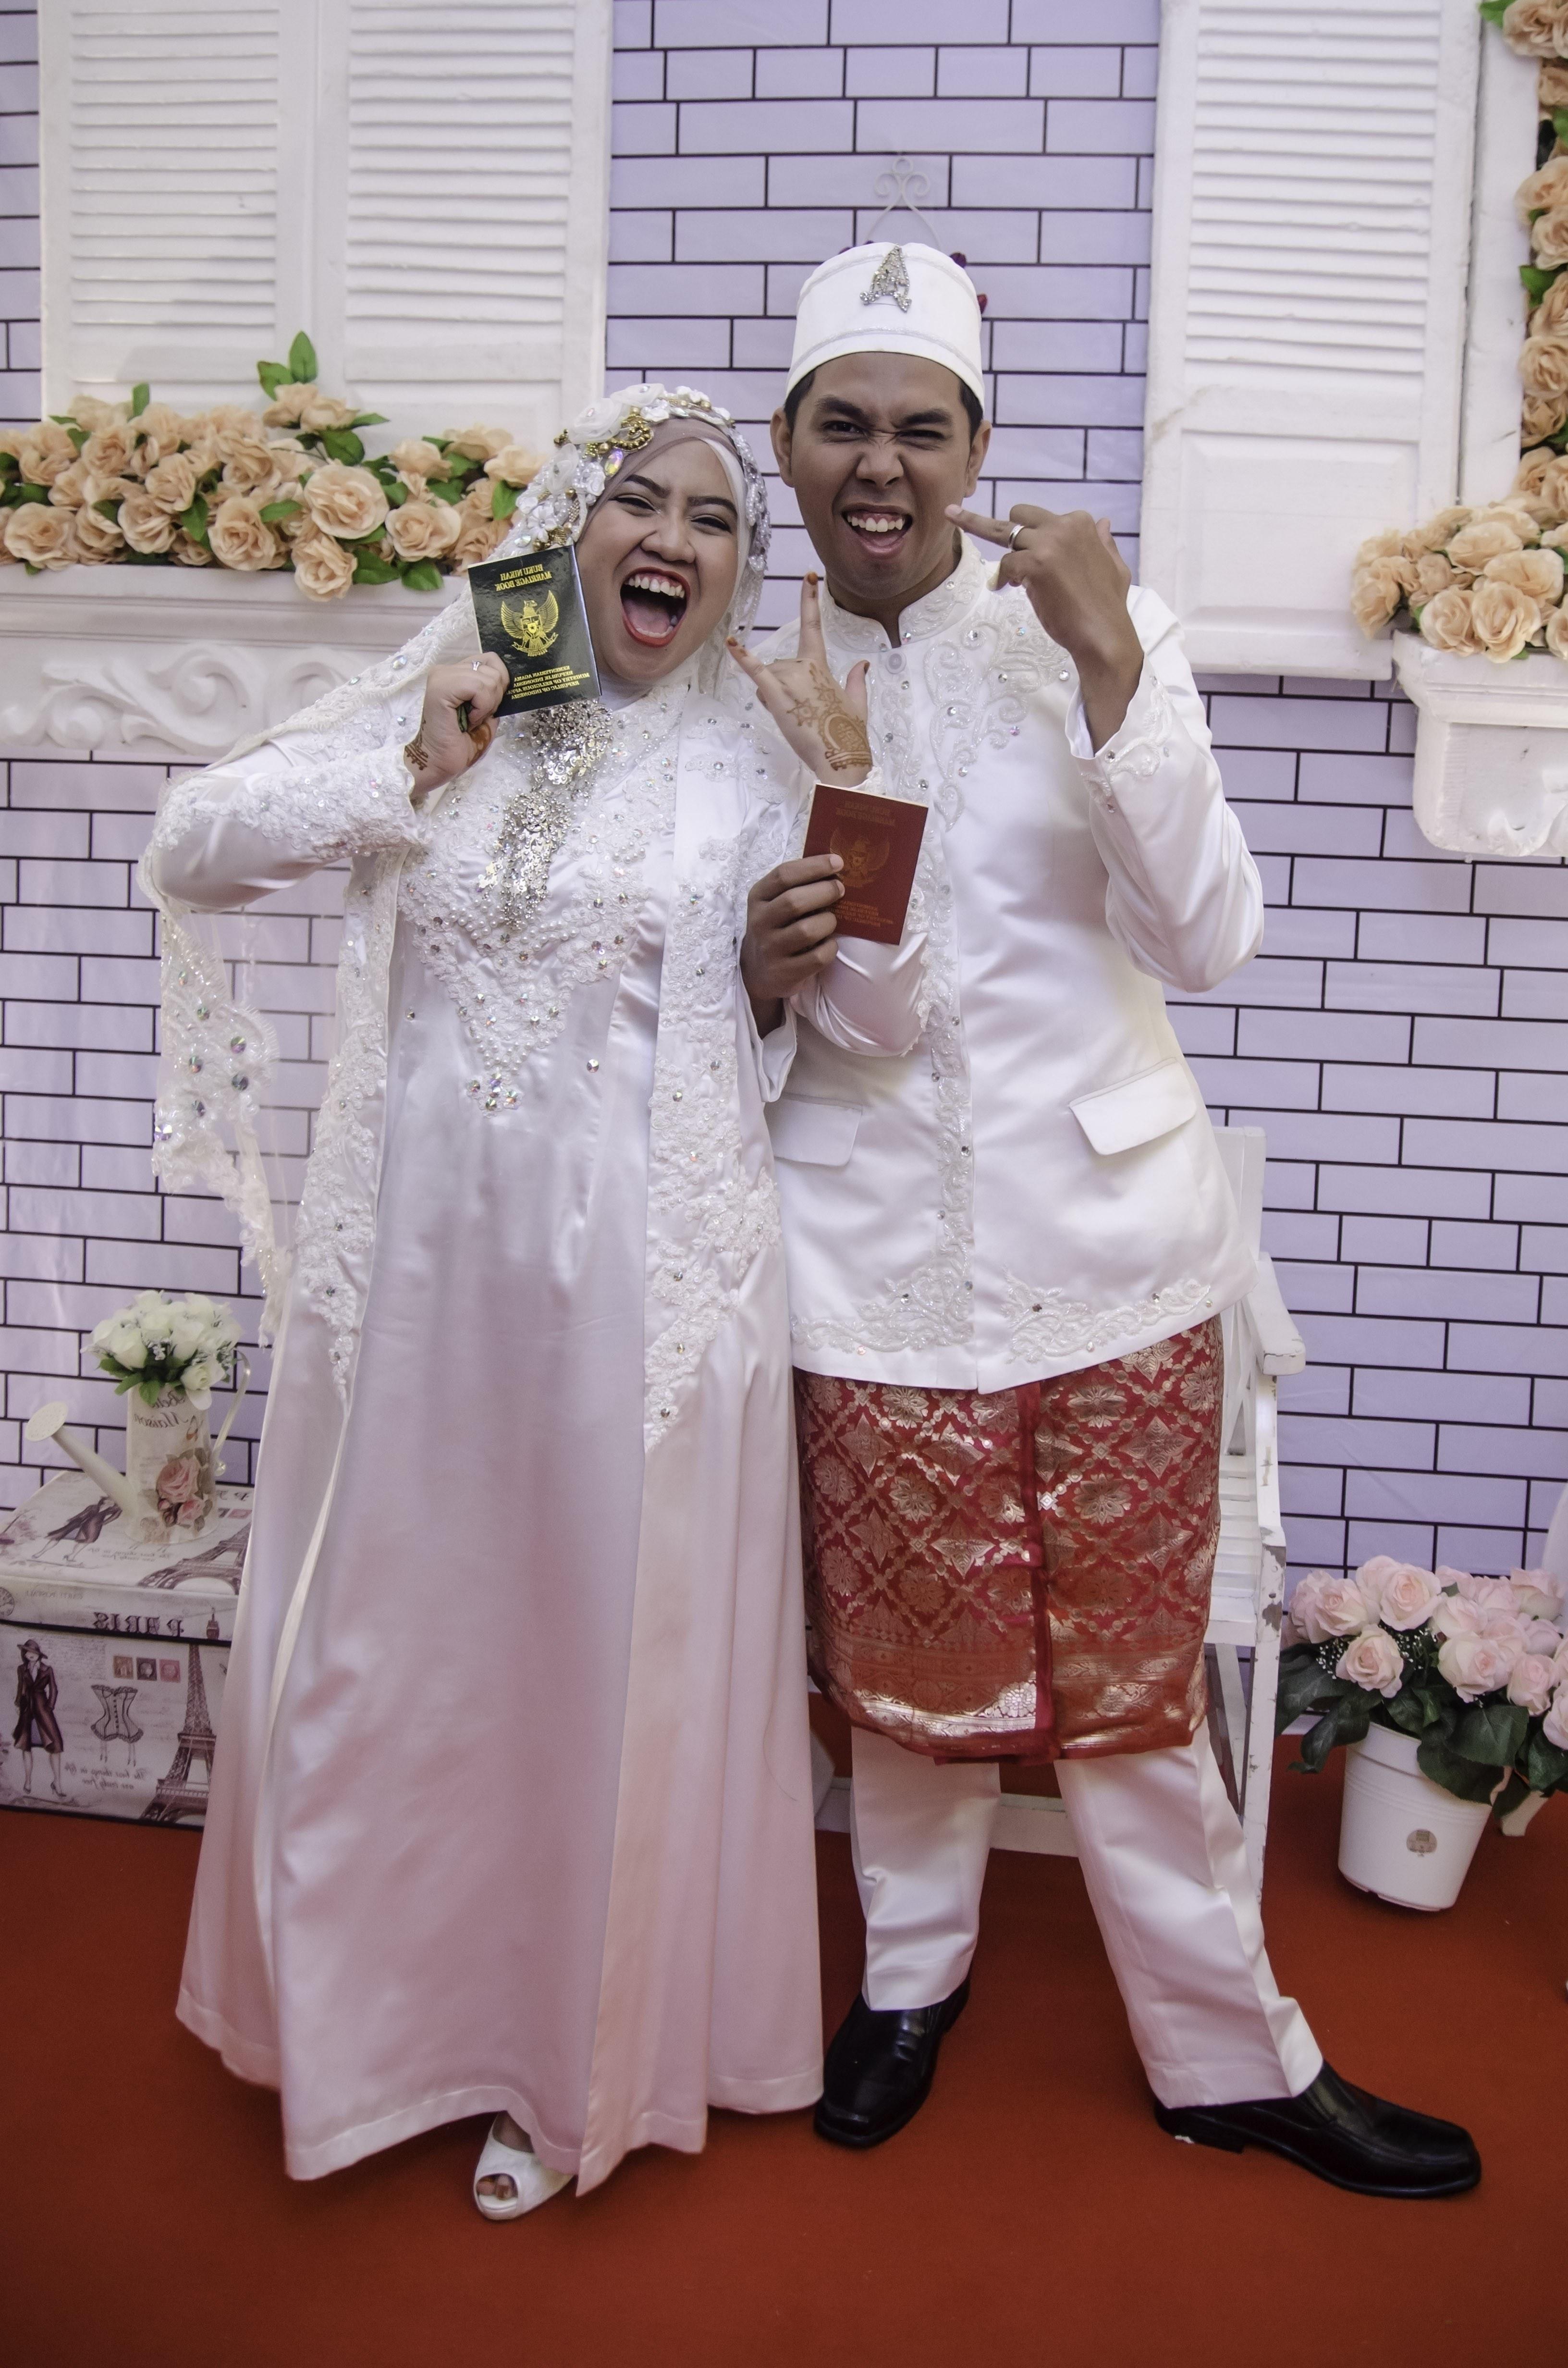 Inspirasi Harga Baju Pengantin Muslimah Drdp Foto Baju Pengantin Hijab Unik Jual Mainboard W210cumb 0d